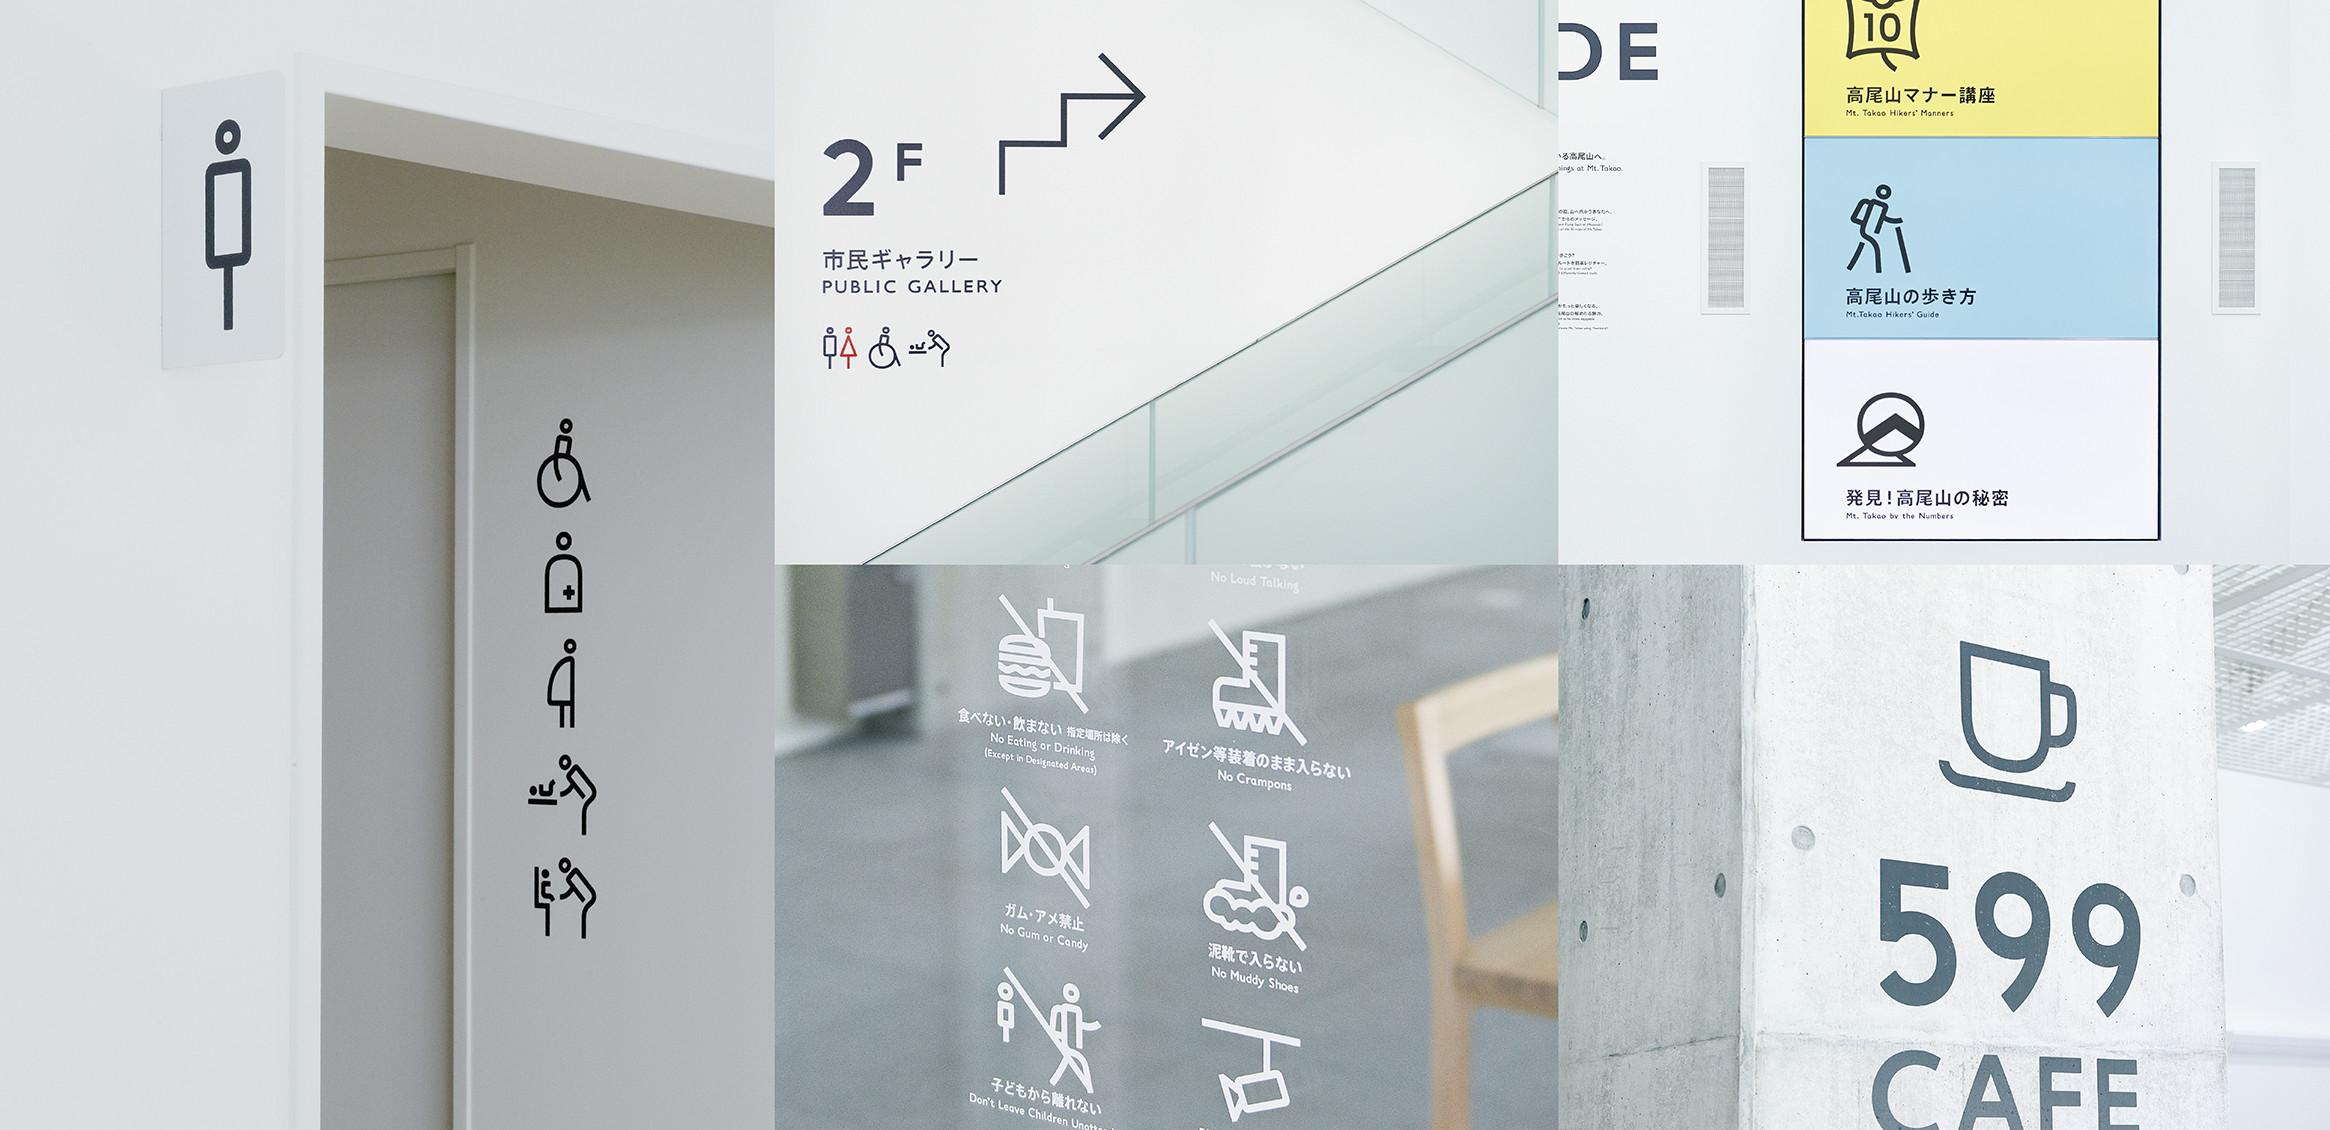 TAKAO 599 MUSEUM7枚目